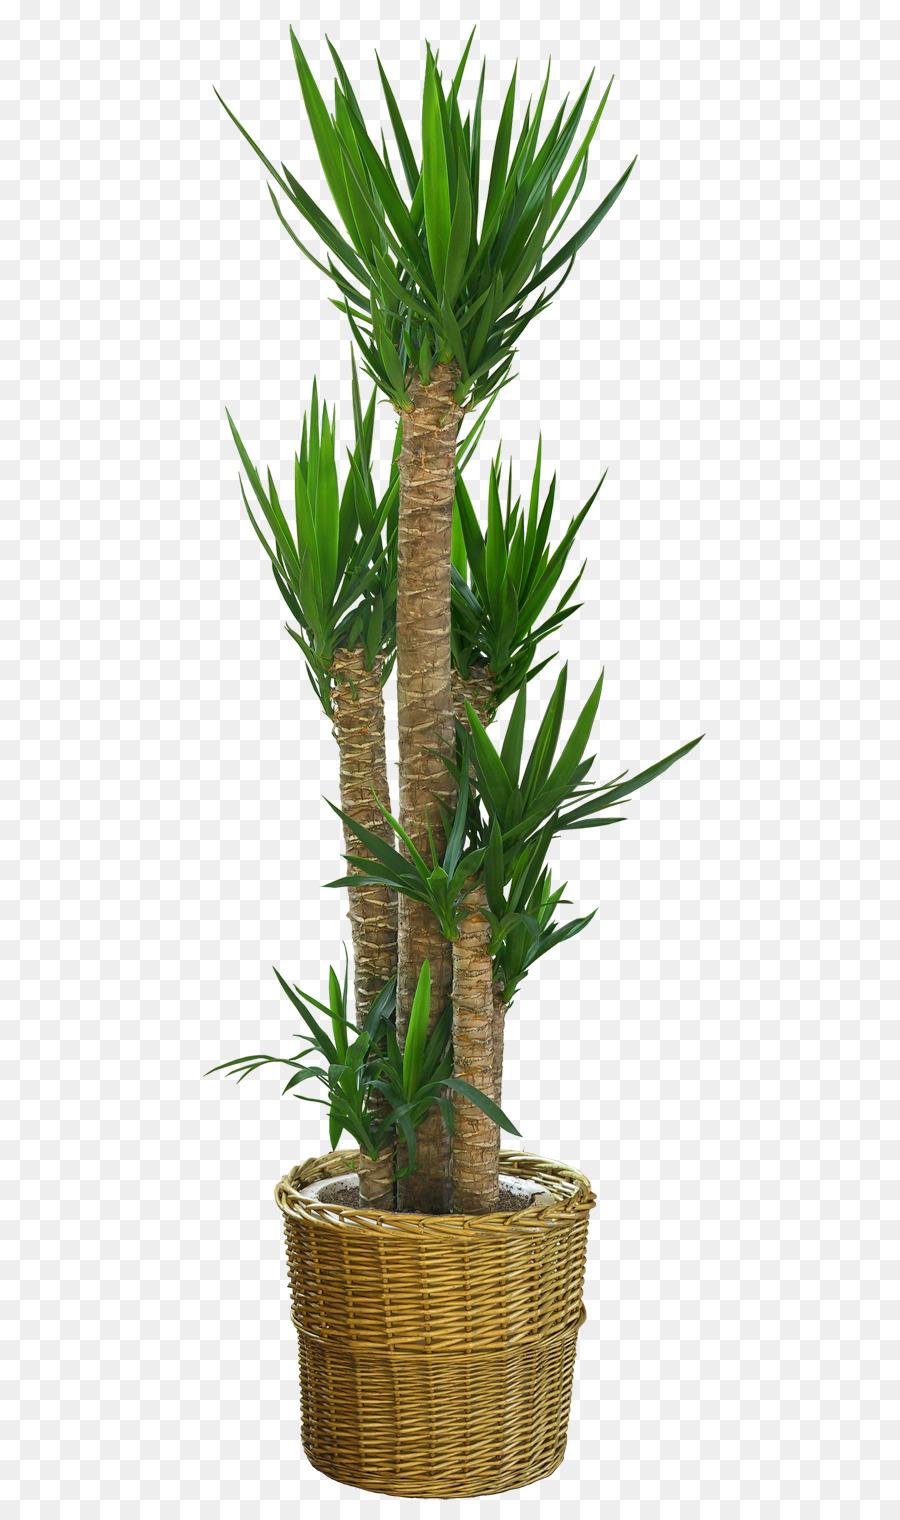 https://banner2.kisspng.com/20180328/oye/kisspng-dracaena-draco-flowerpot-plant-potted-plant-5abc15e1d3d6b5.1581600315222758098677.jpg Dracaena